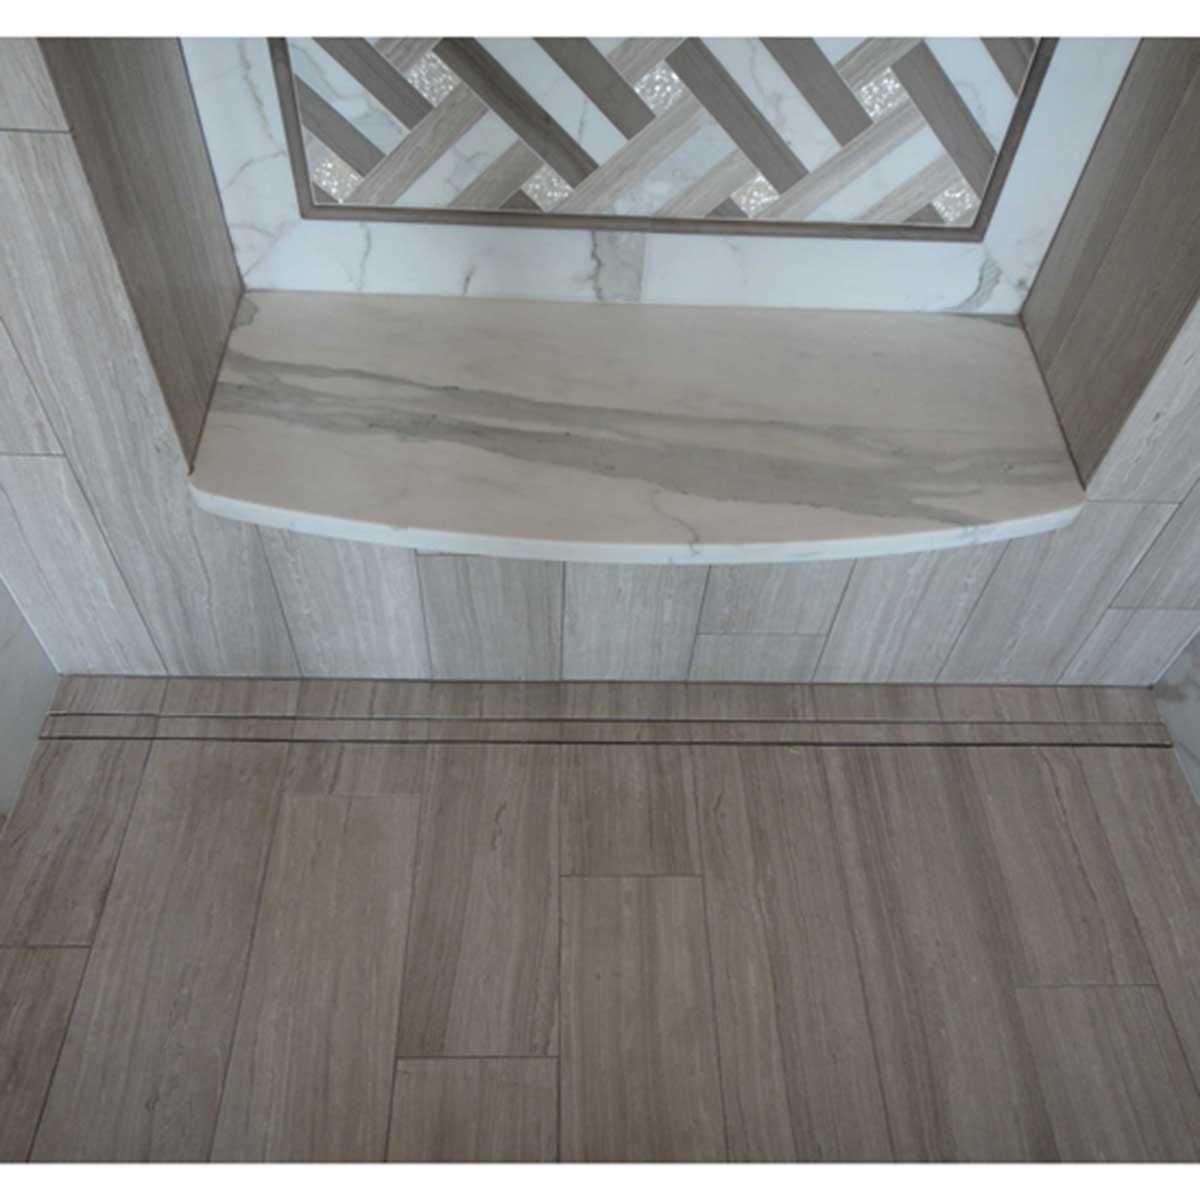 Quick Drain ProLine Linear Shower Drain Body W/ Tile-In Cover